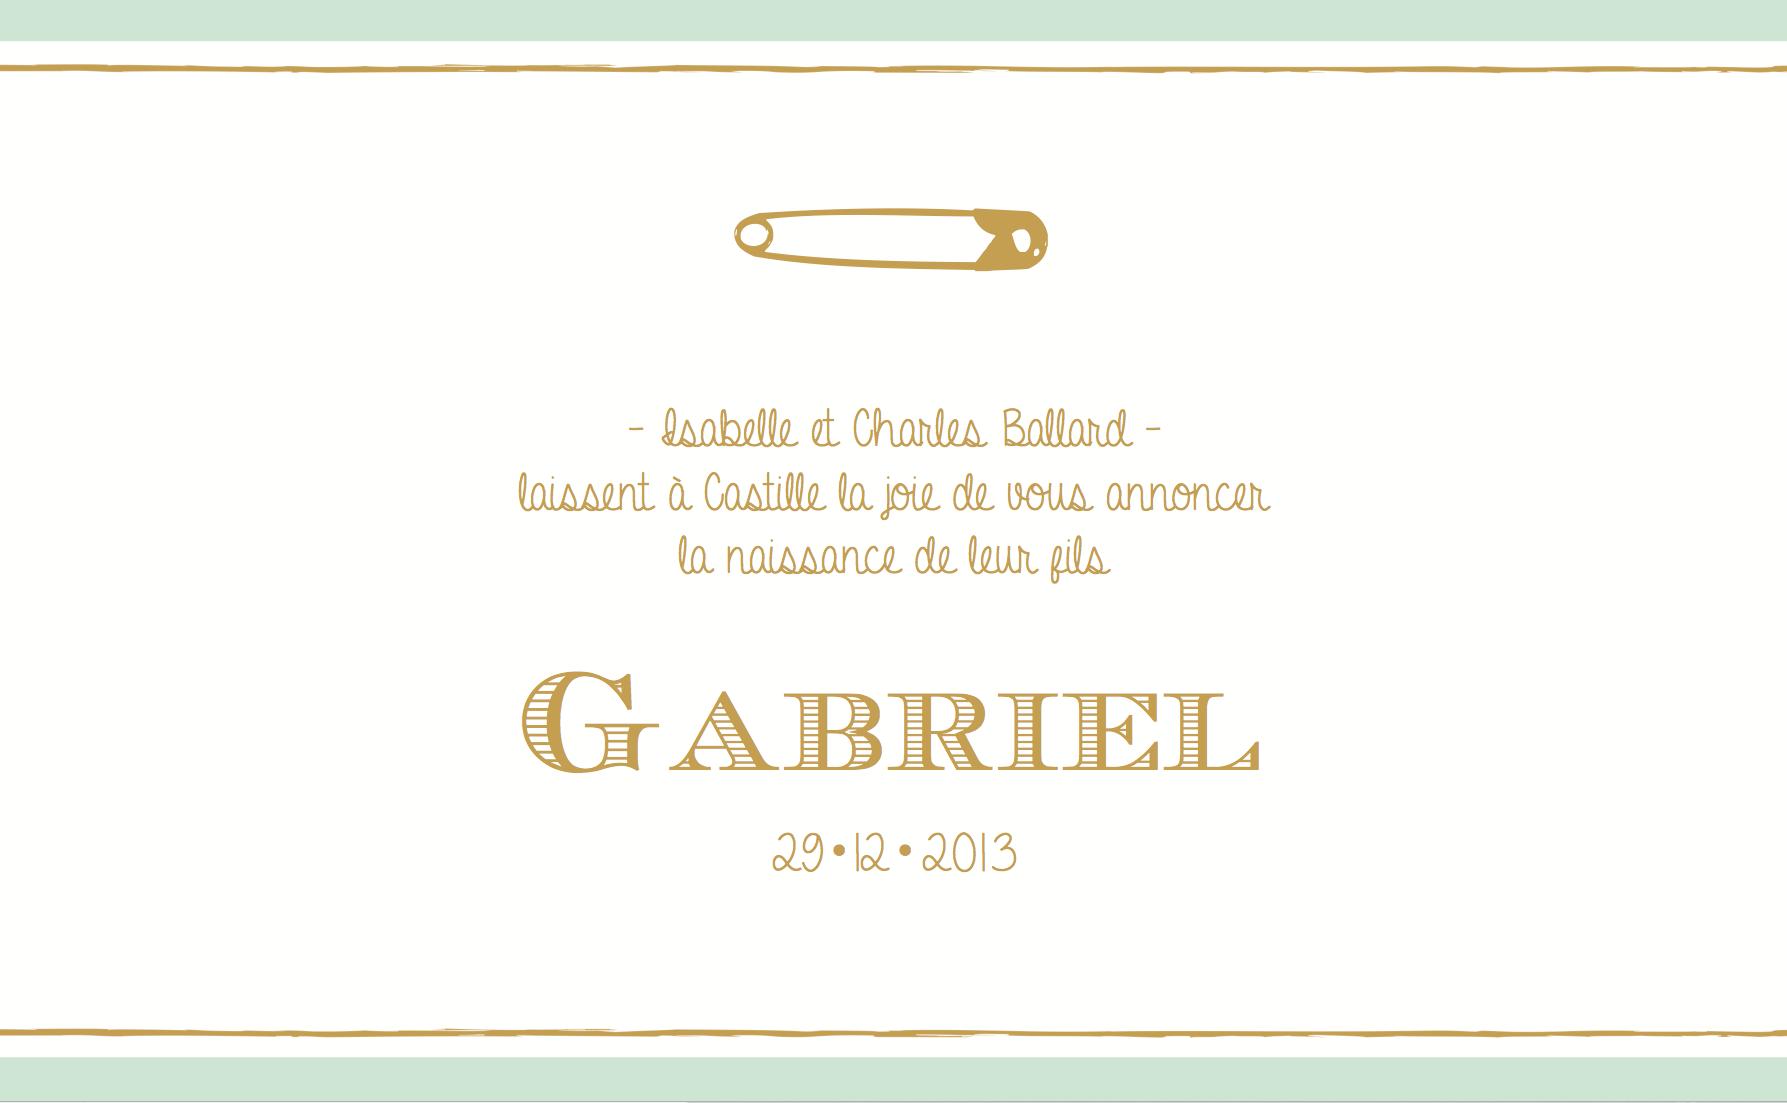 Gabriel recto rectangulaire